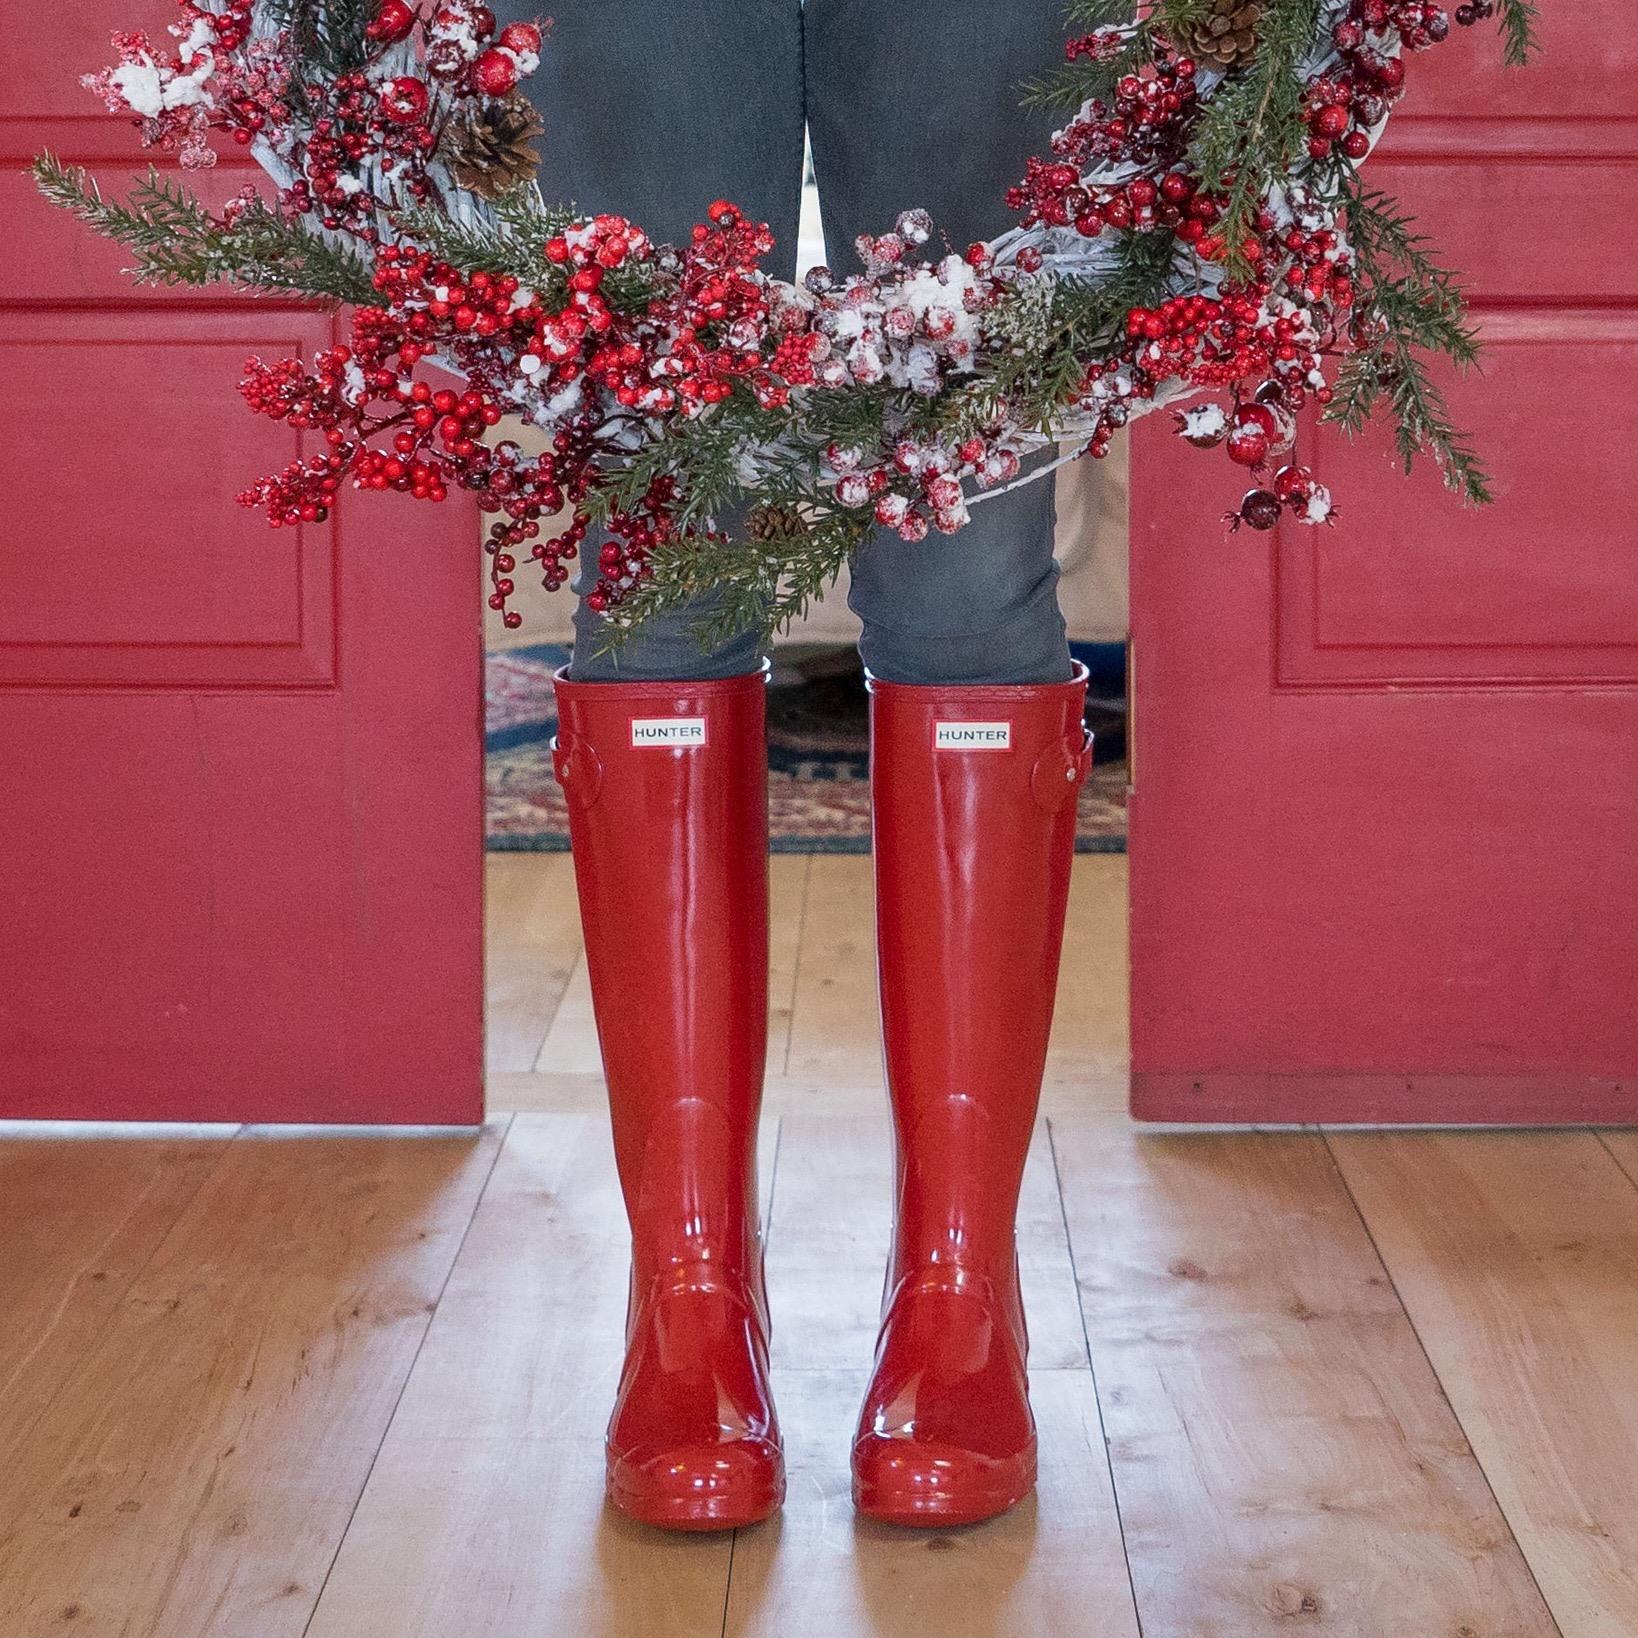 Hello-Olivia-Photography-Long-Island-NY-Children-family-portraits-nordstrom-boots-red-hunters.jpg